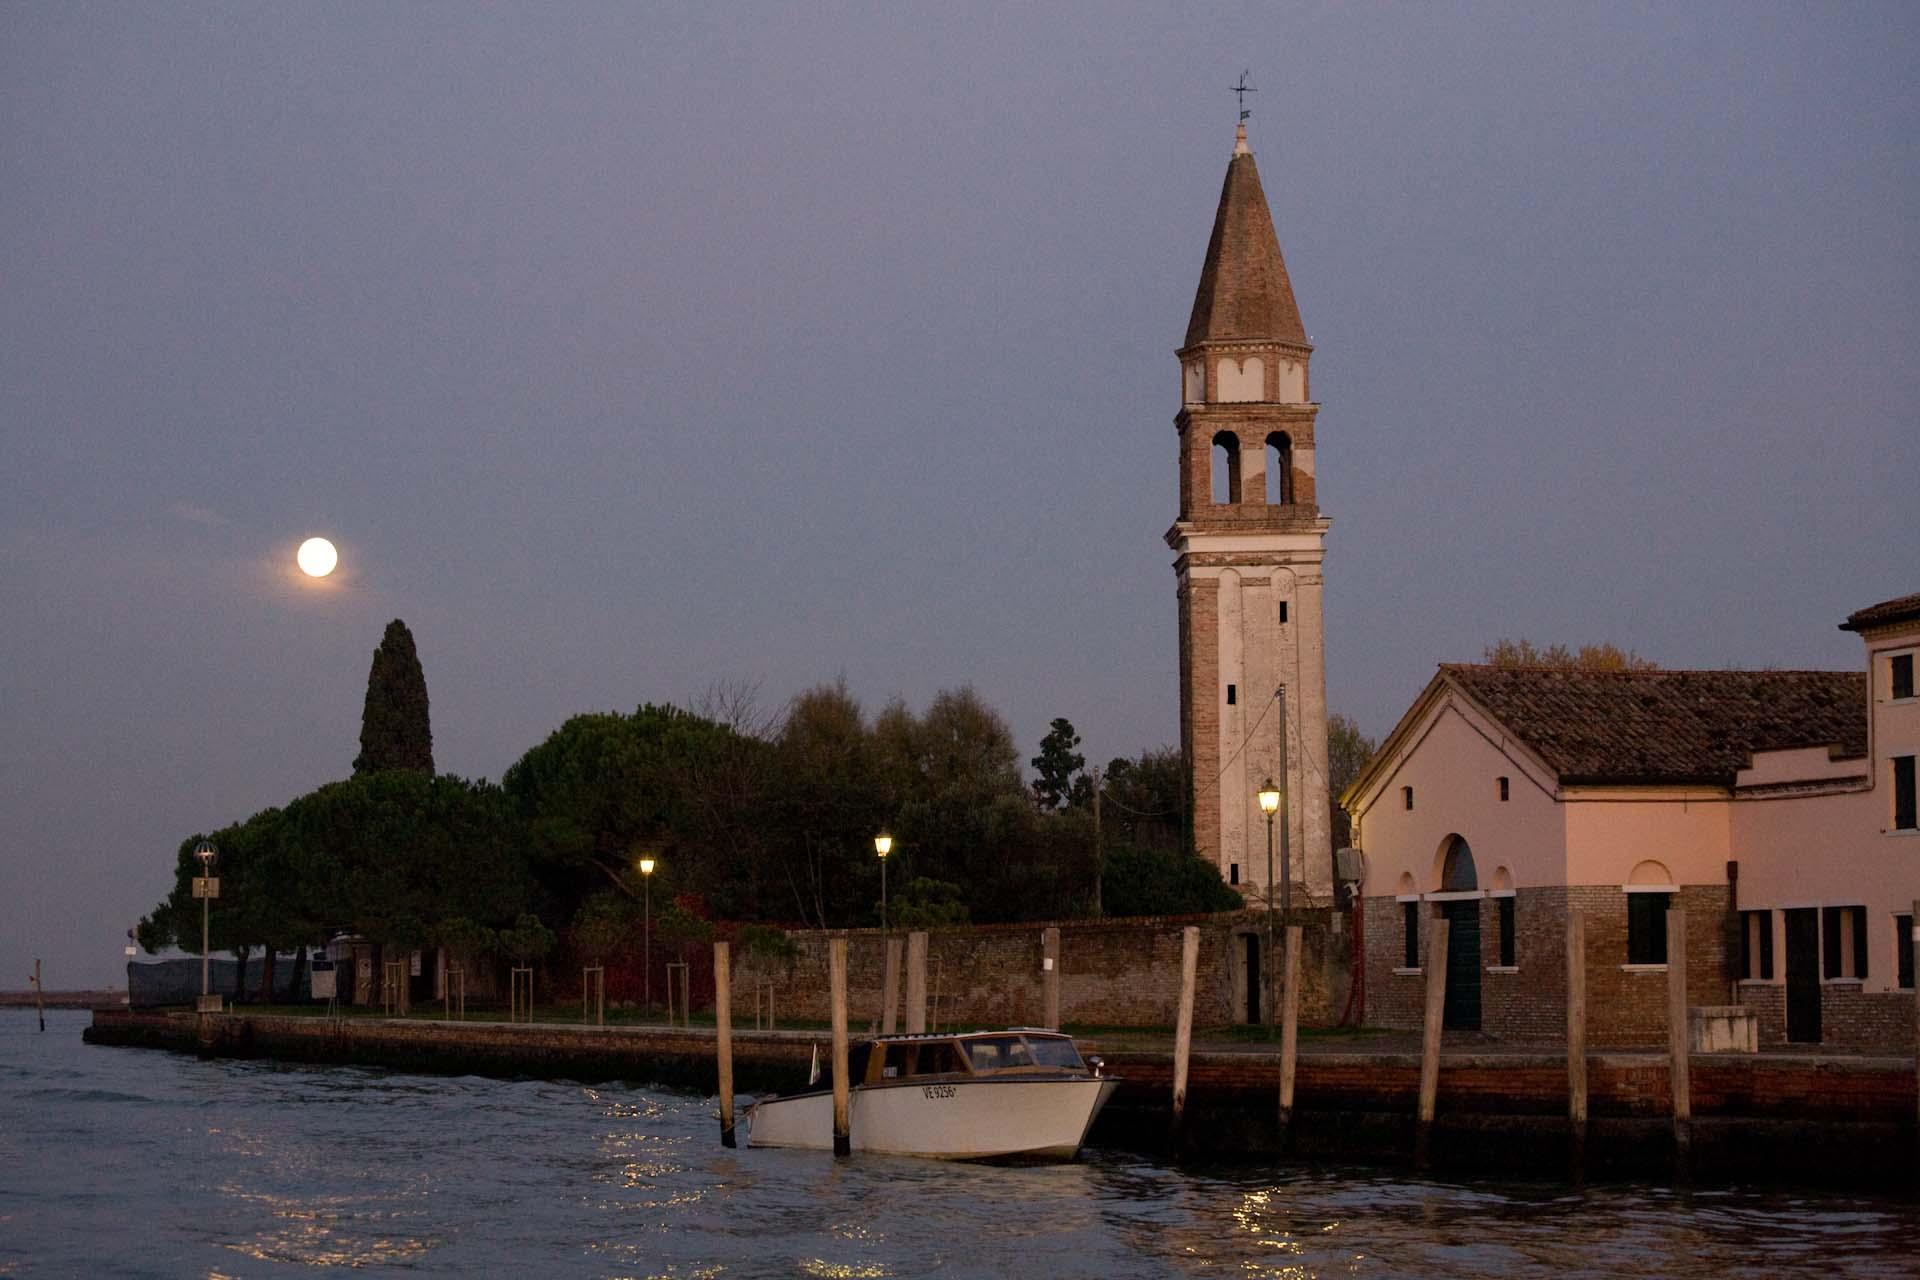 ITA, Italy, Venezia, 2011-11-10, Burano © Stefan Pangritz